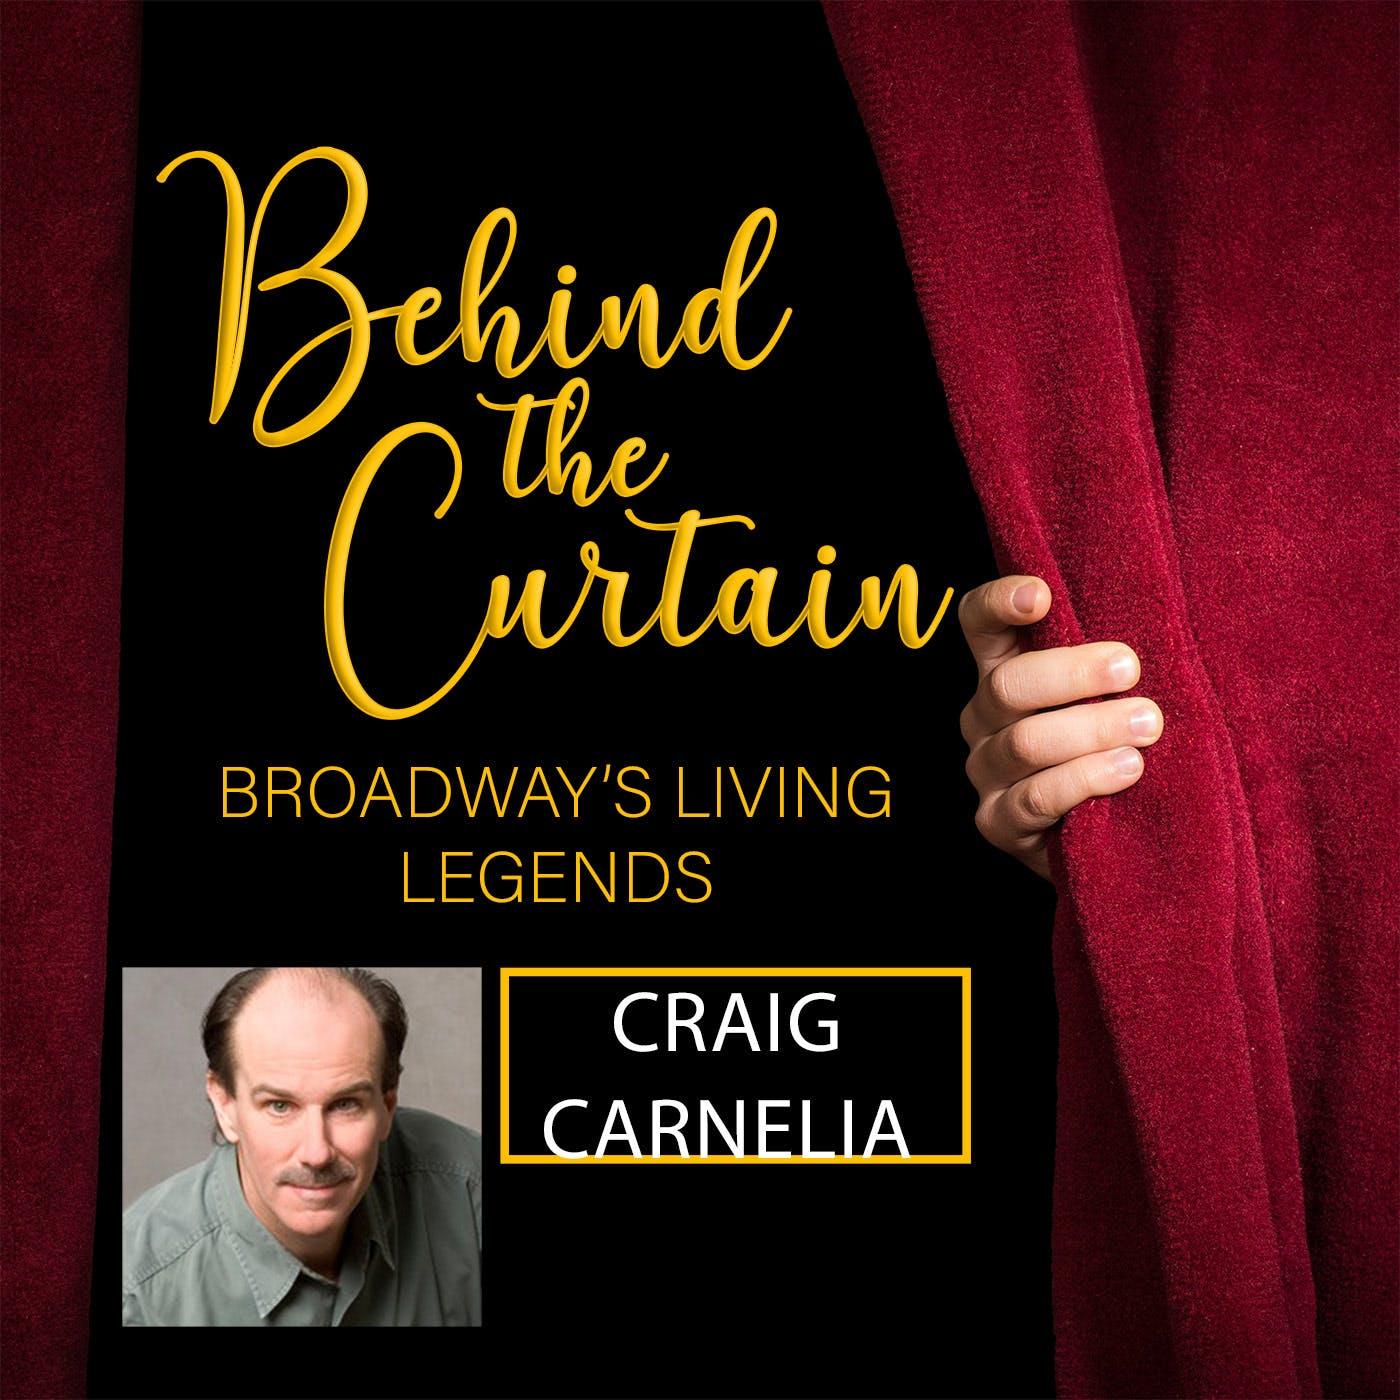 #262 CRAIG CARNELIA, Songwriter